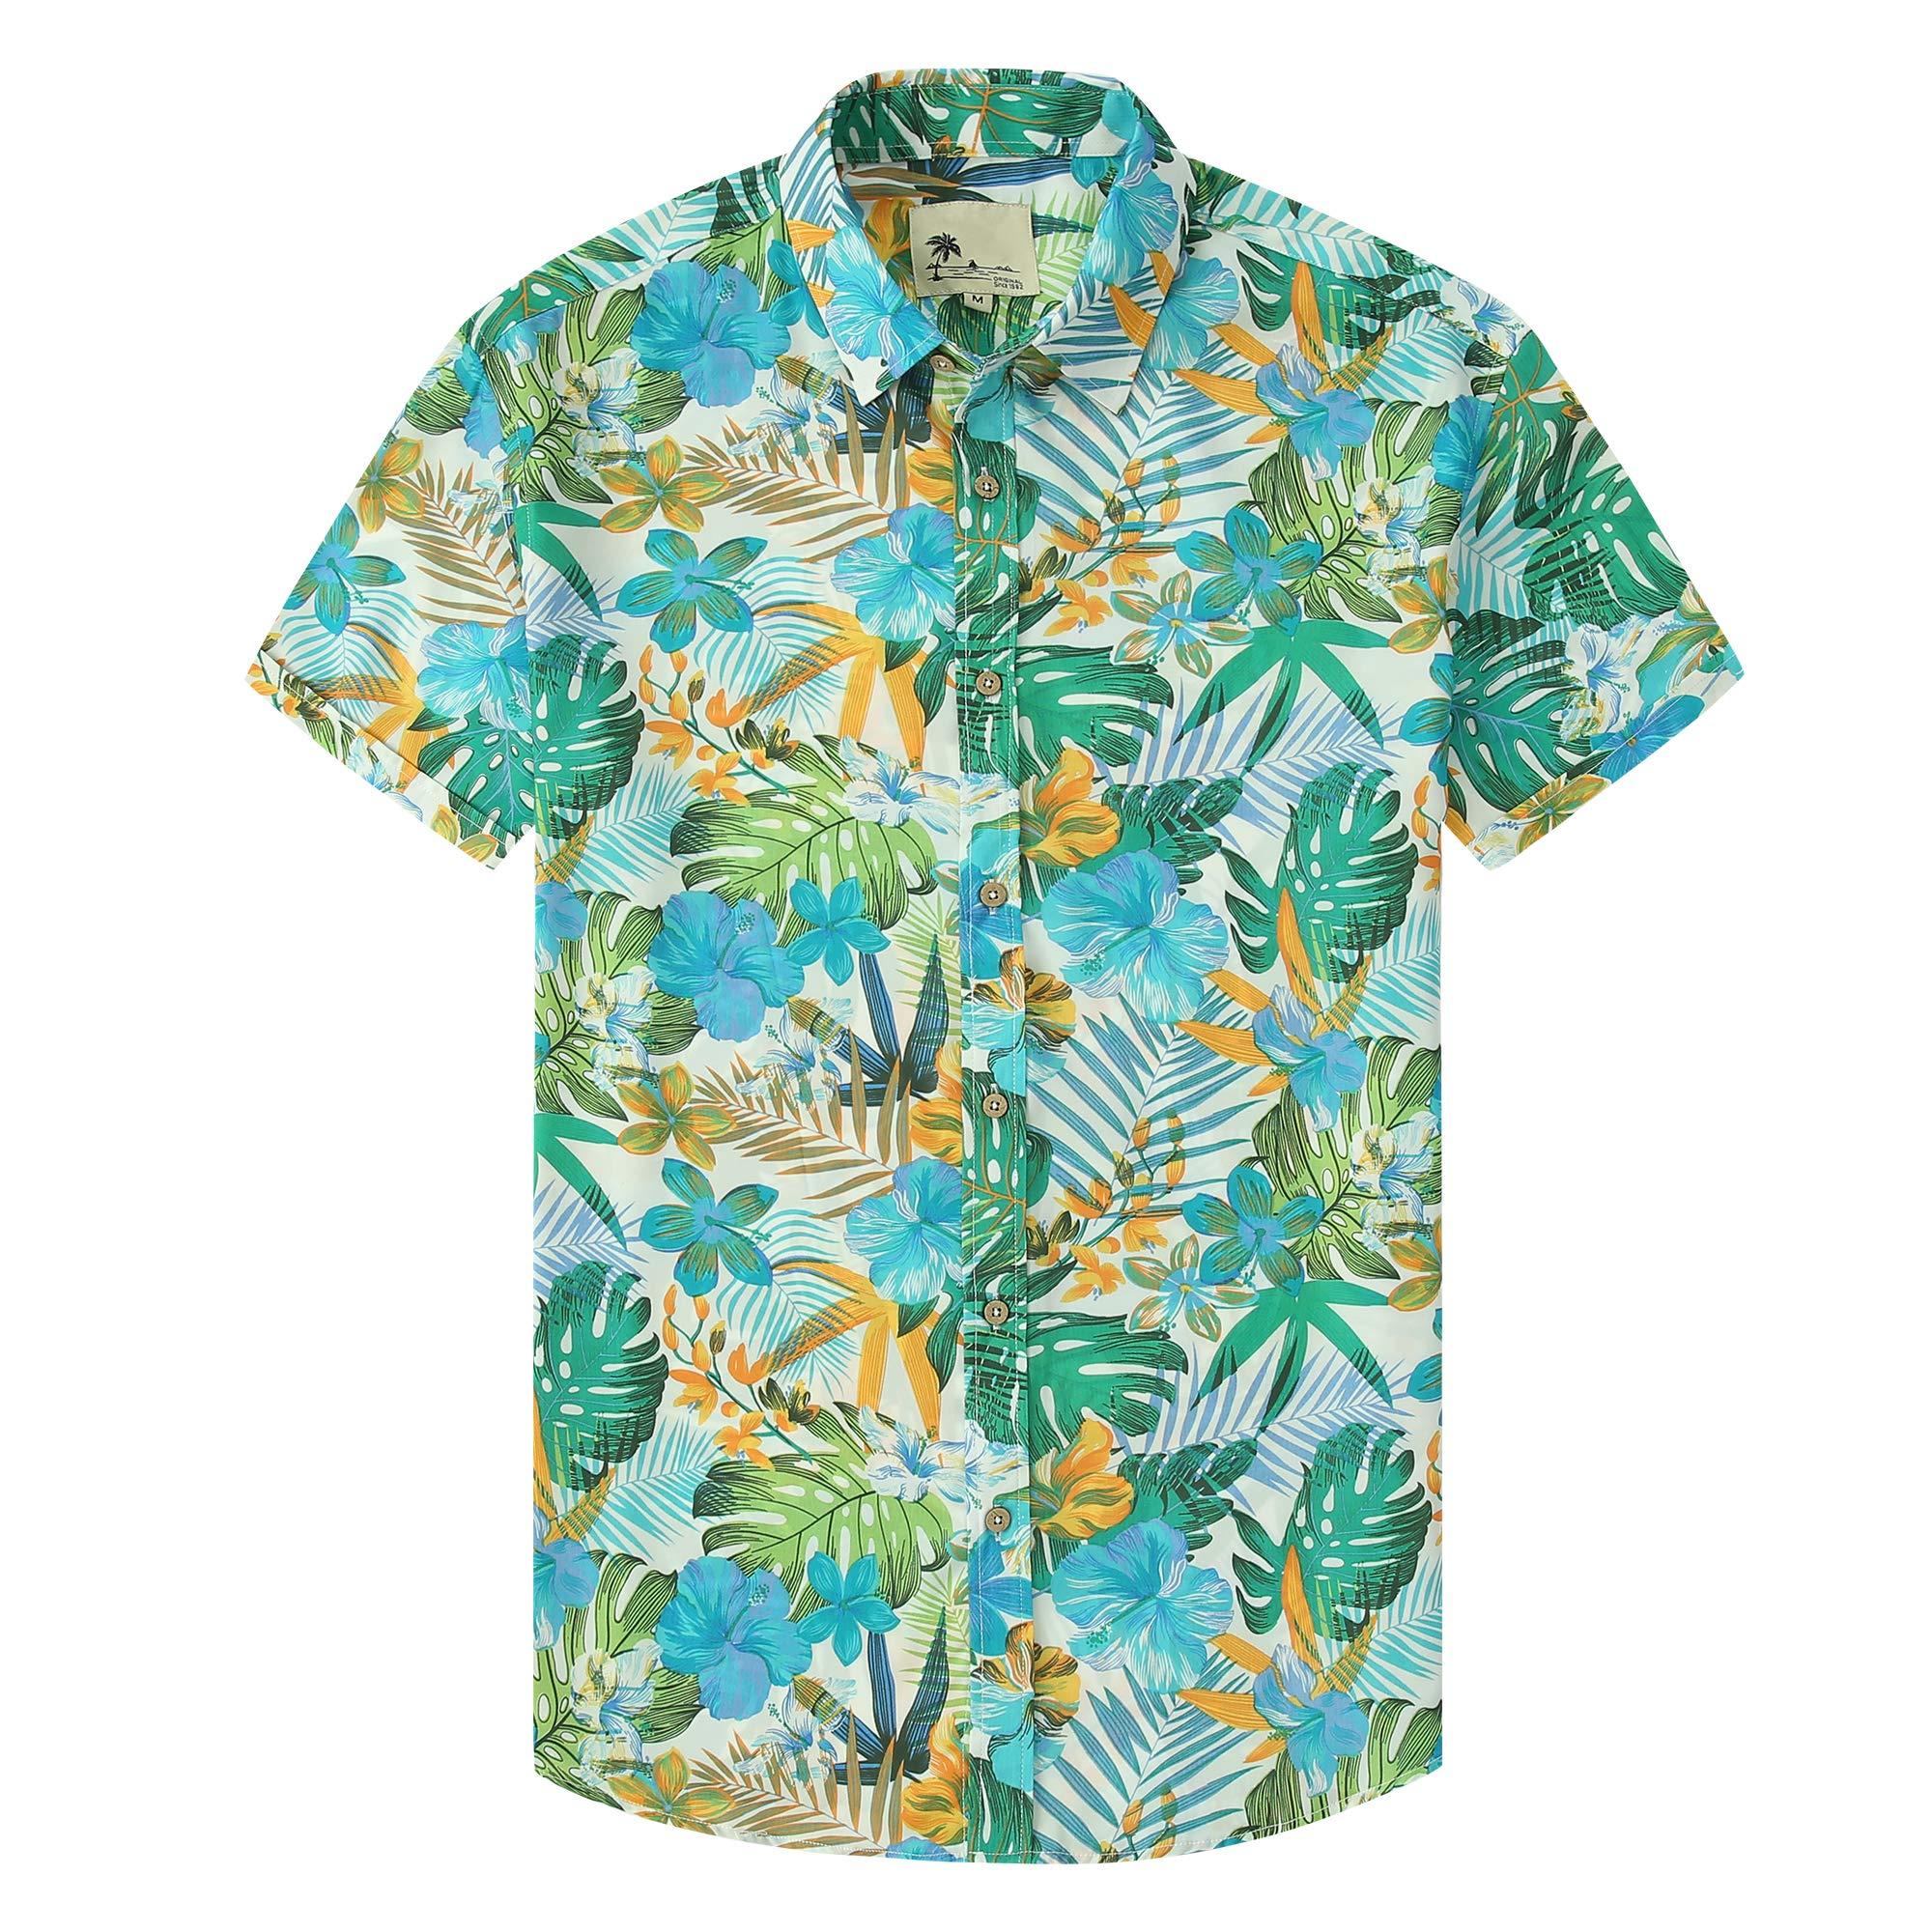 Hawaiian Shirts for Men Short Sleeve Aloha Beach Shirt Floral Summer Casual Button Down Shirts